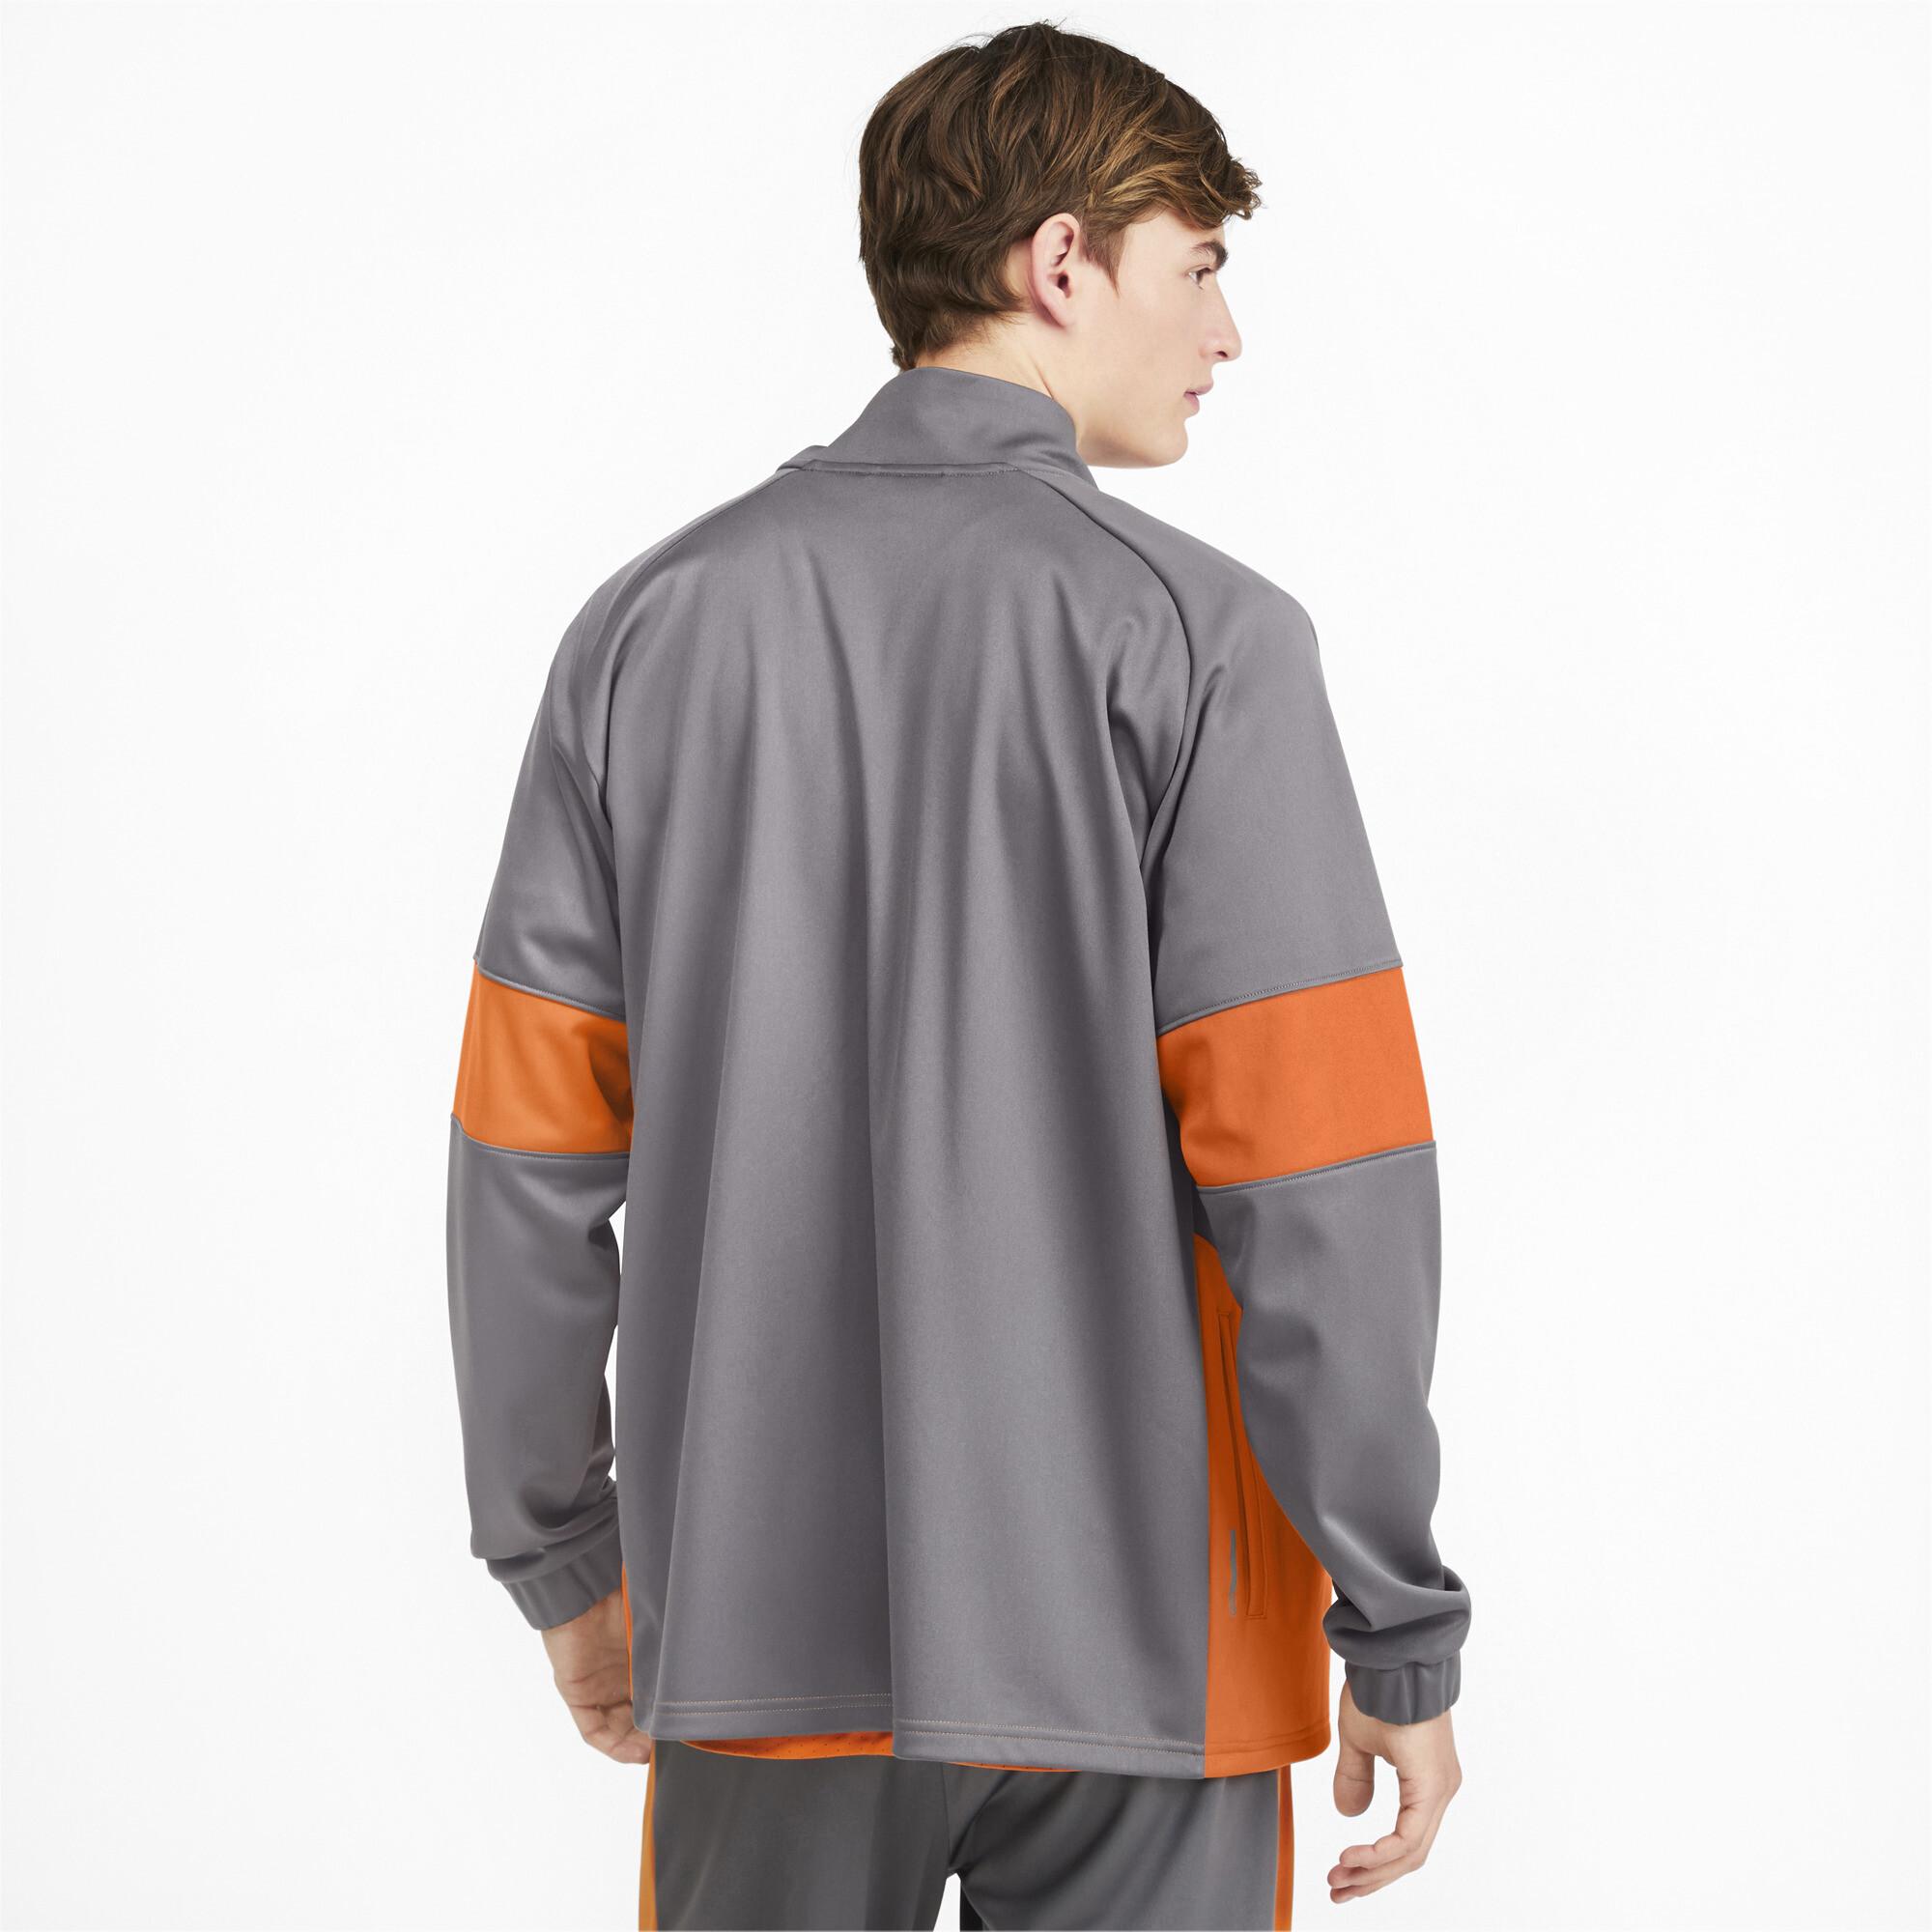 PUMA-PUMA-Blaster-Men-039-s-Jacket-Men-Knitted-Jacket-Training thumbnail 11